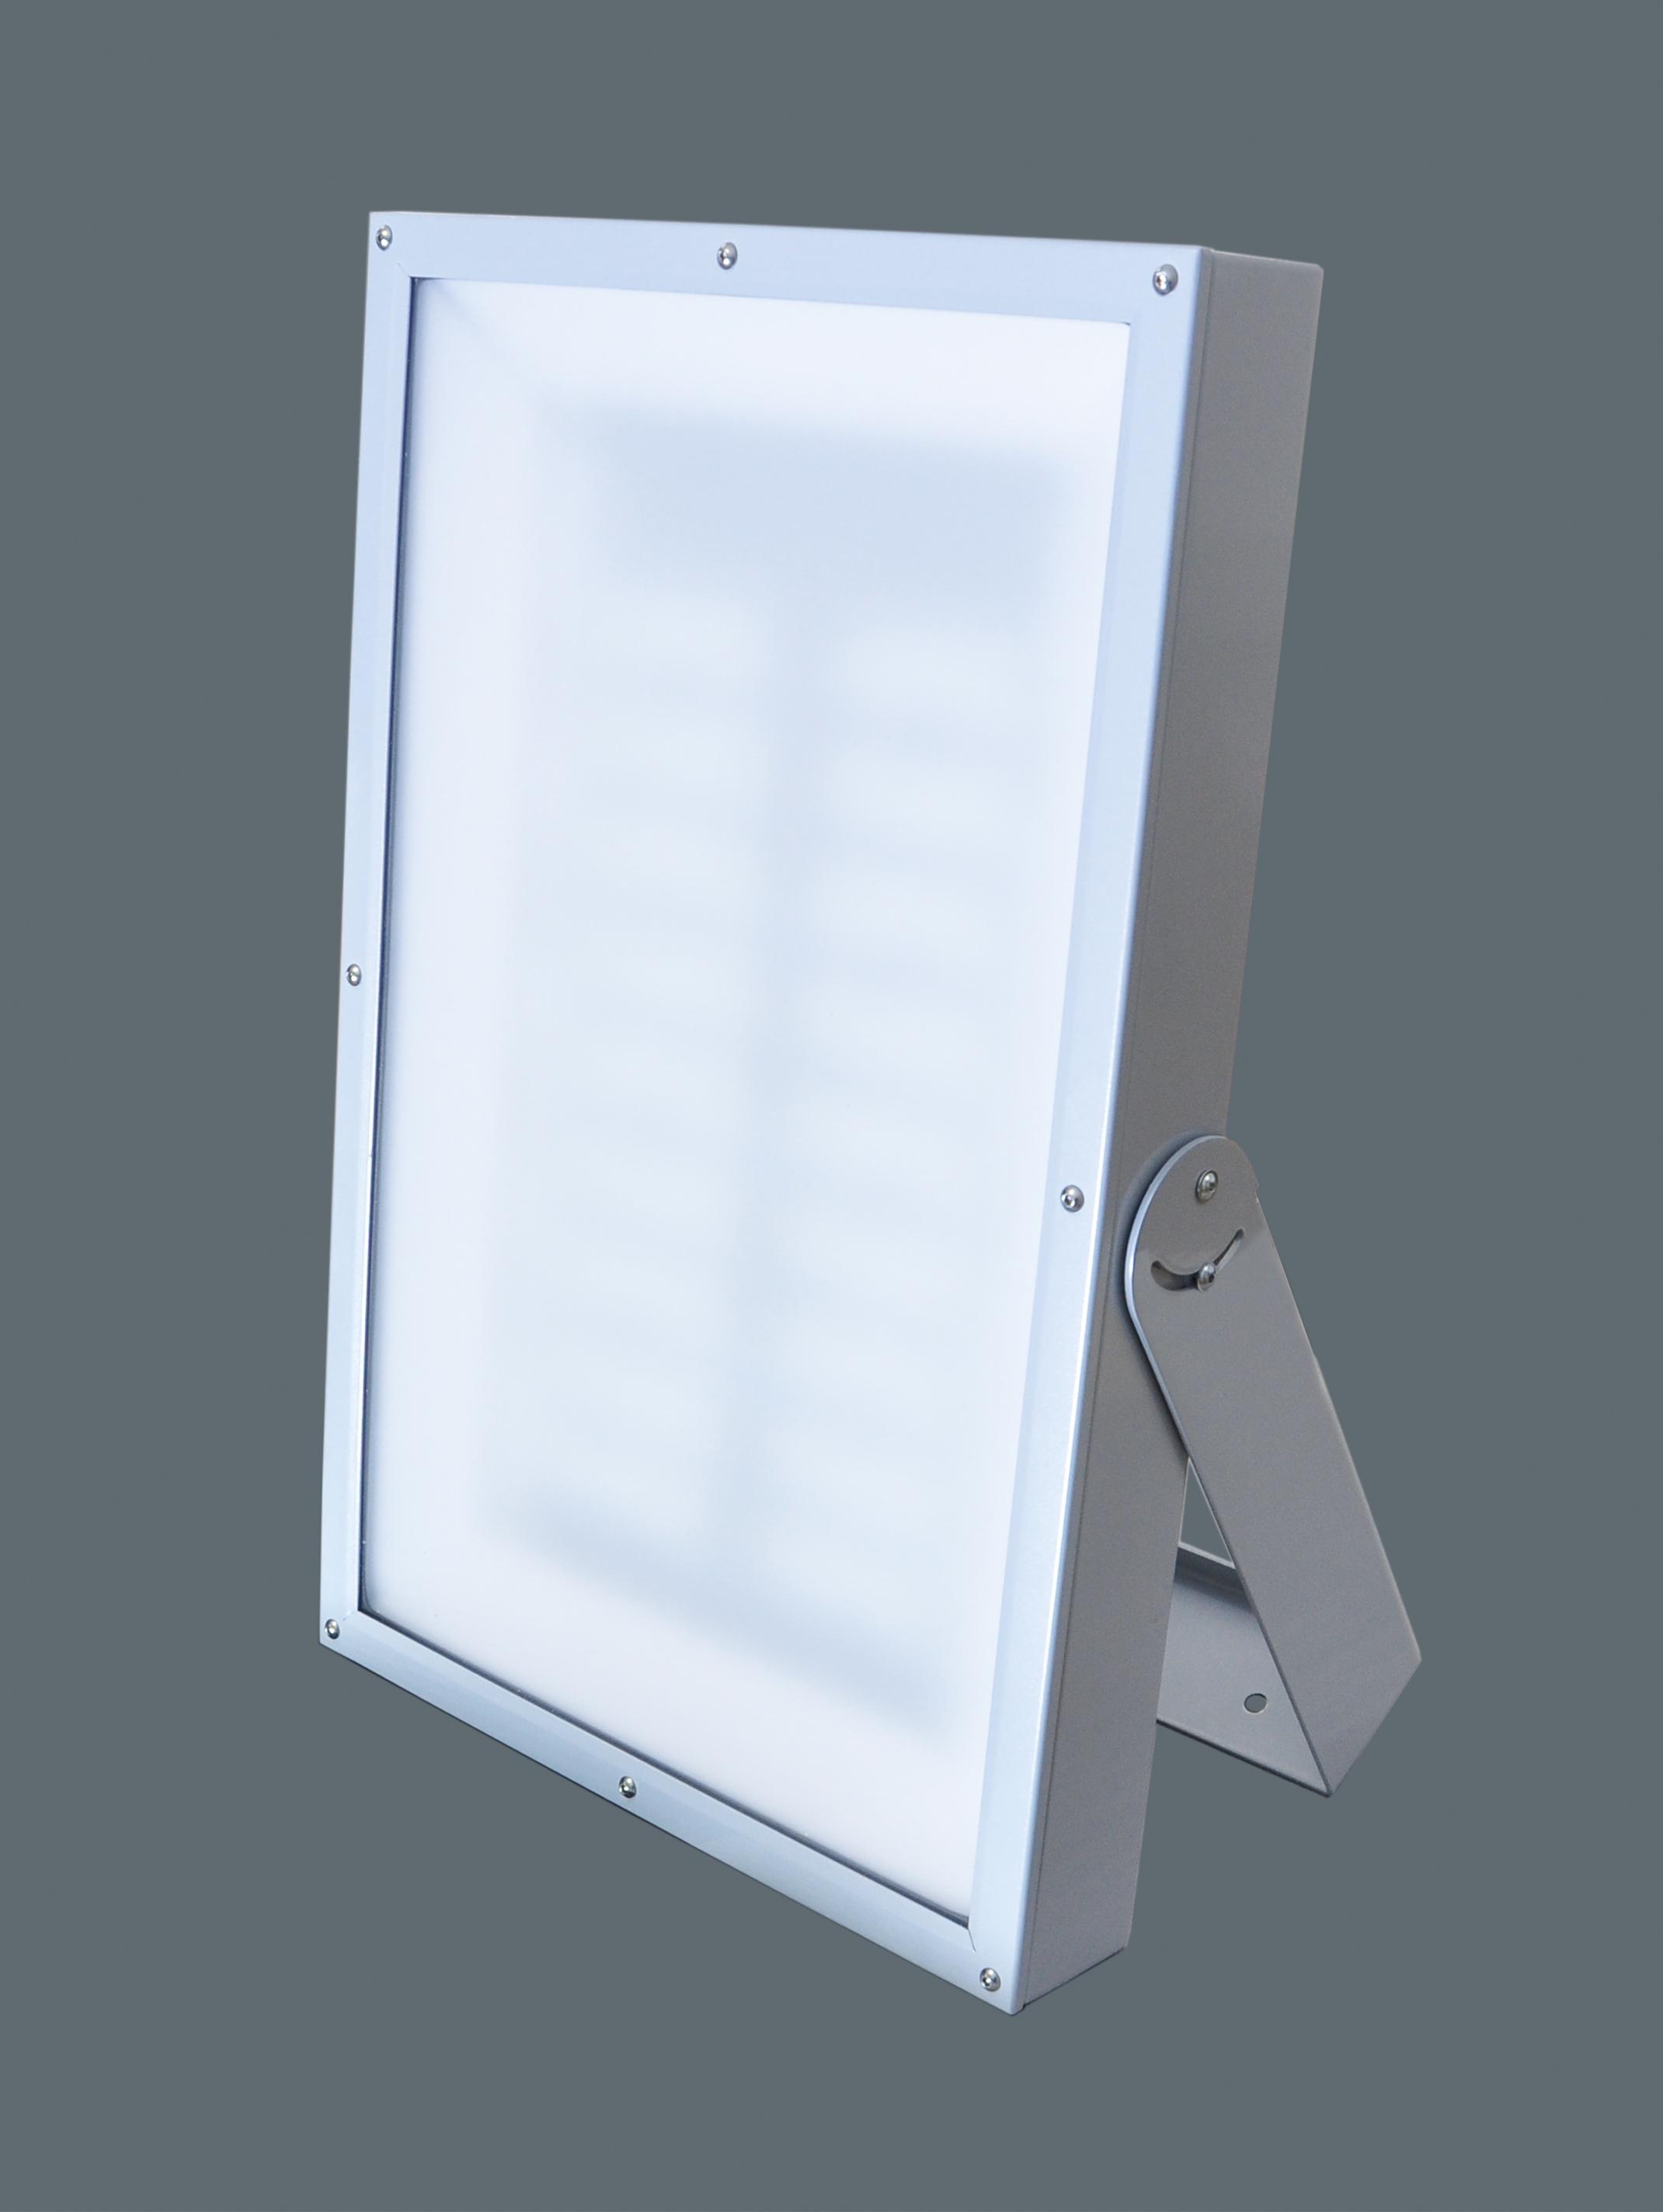 starker auftritt aussenstrahler shl von as led lighting firmenpresse. Black Bedroom Furniture Sets. Home Design Ideas